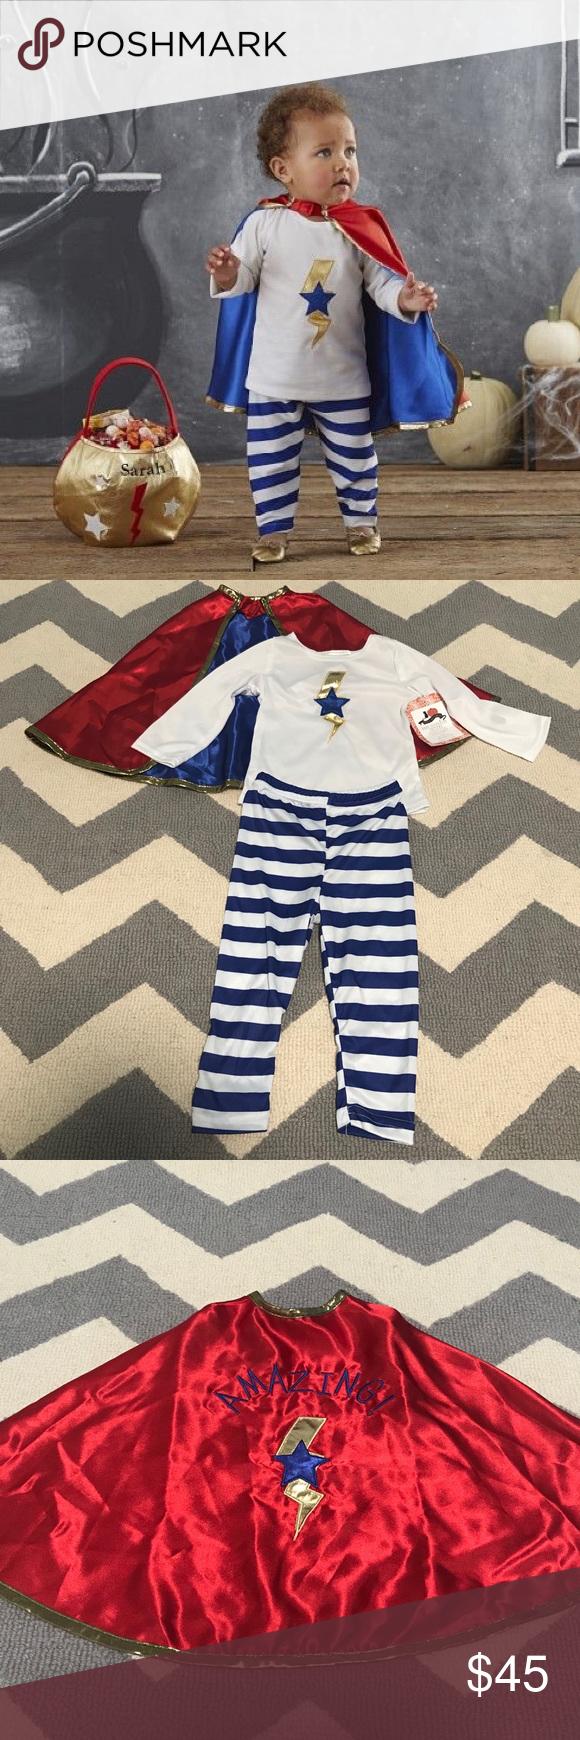 Pottery Barn Kids Baby Superhero Costume 1224M NWT Girl